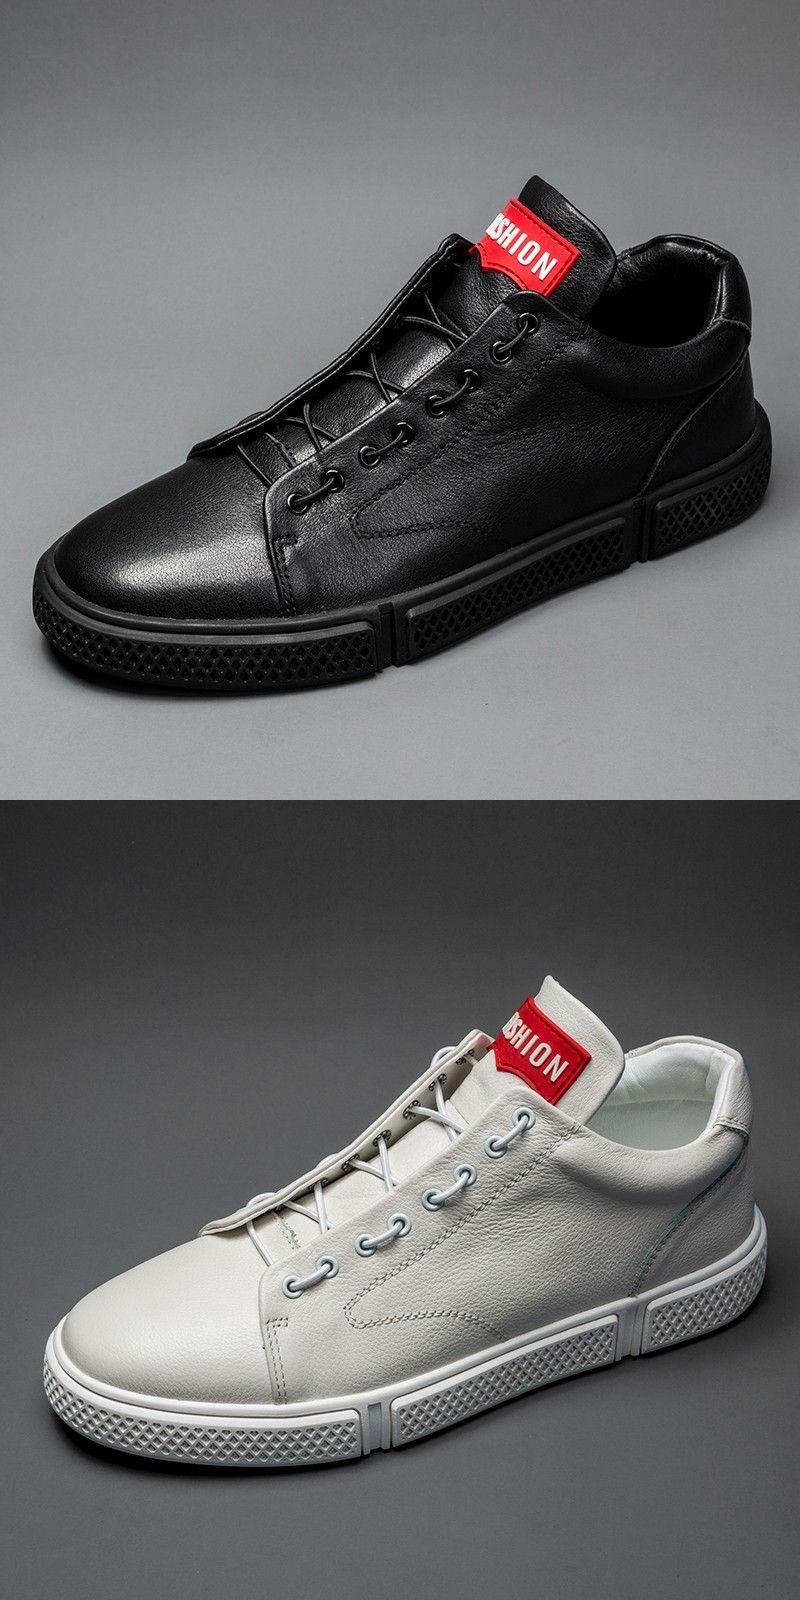 Prelesty Spring High Quality Men Formal Shoes Business Soft Leather Lightweight Comfortable Design